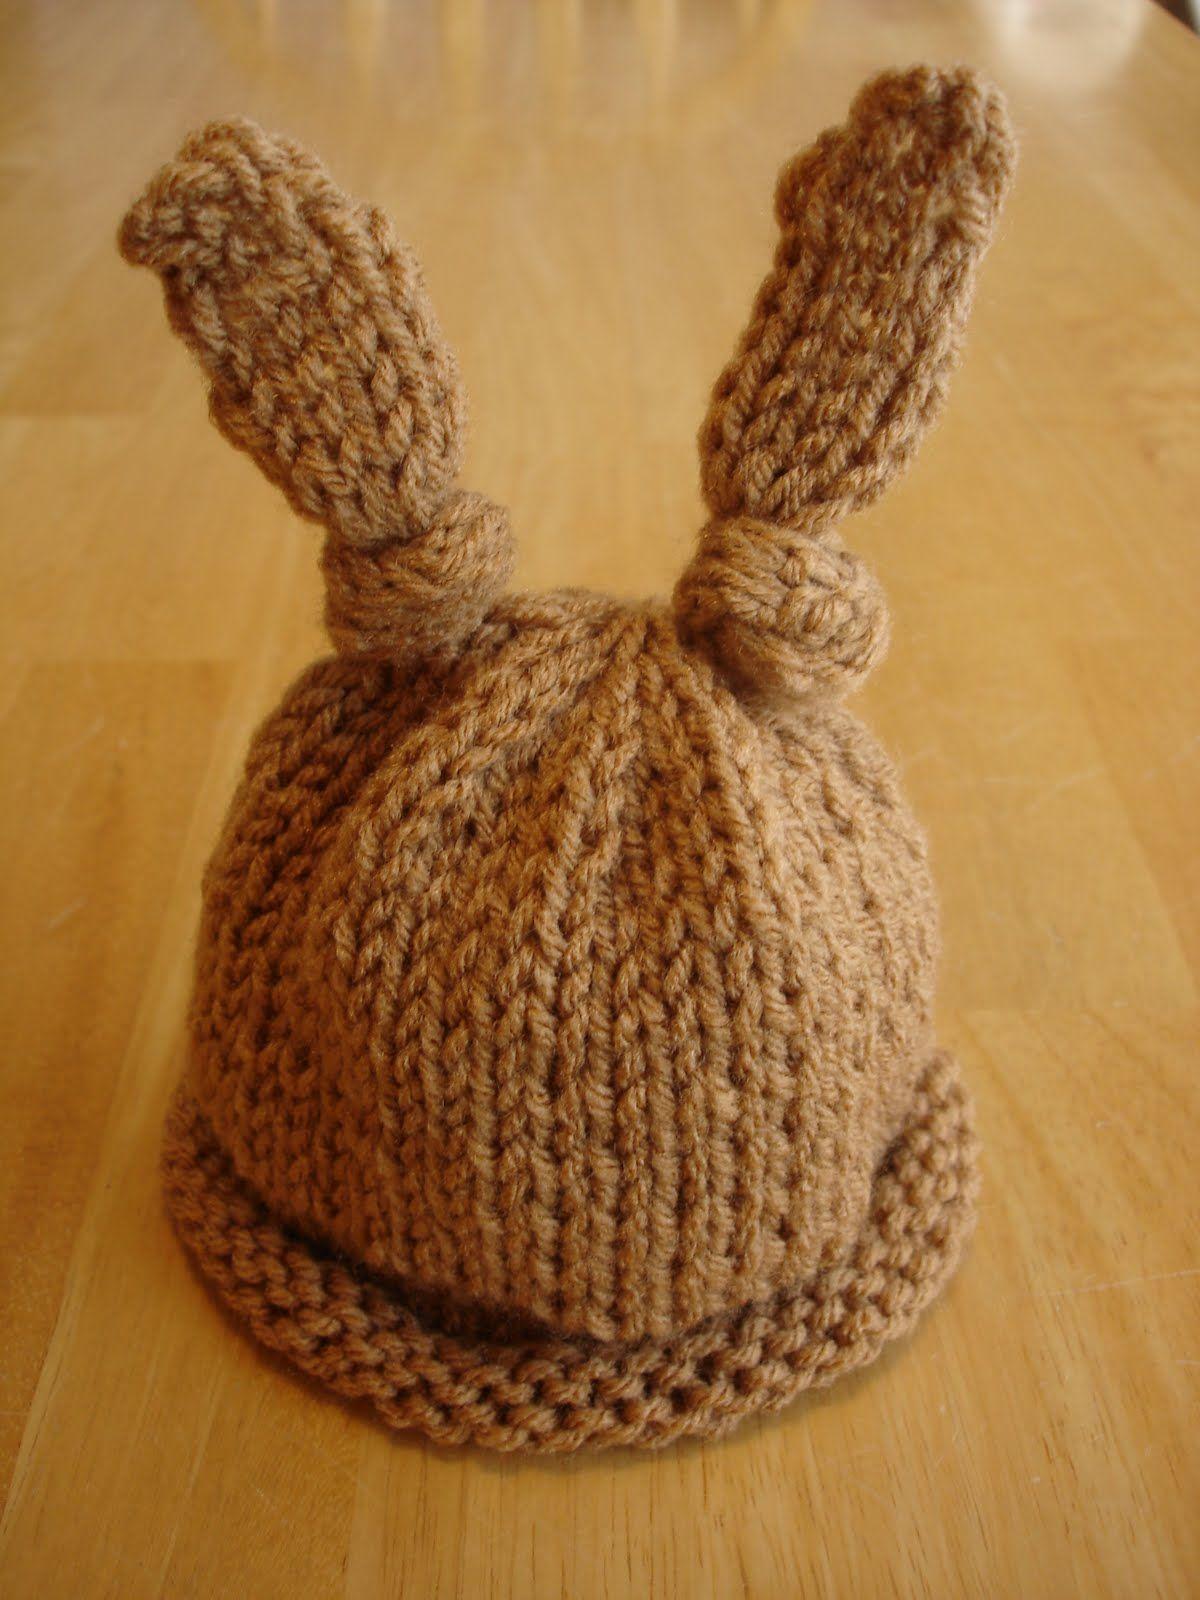 barret de conill | Gorros, Bufandas & Gu@nt€s | Pinterest | Gorros ...